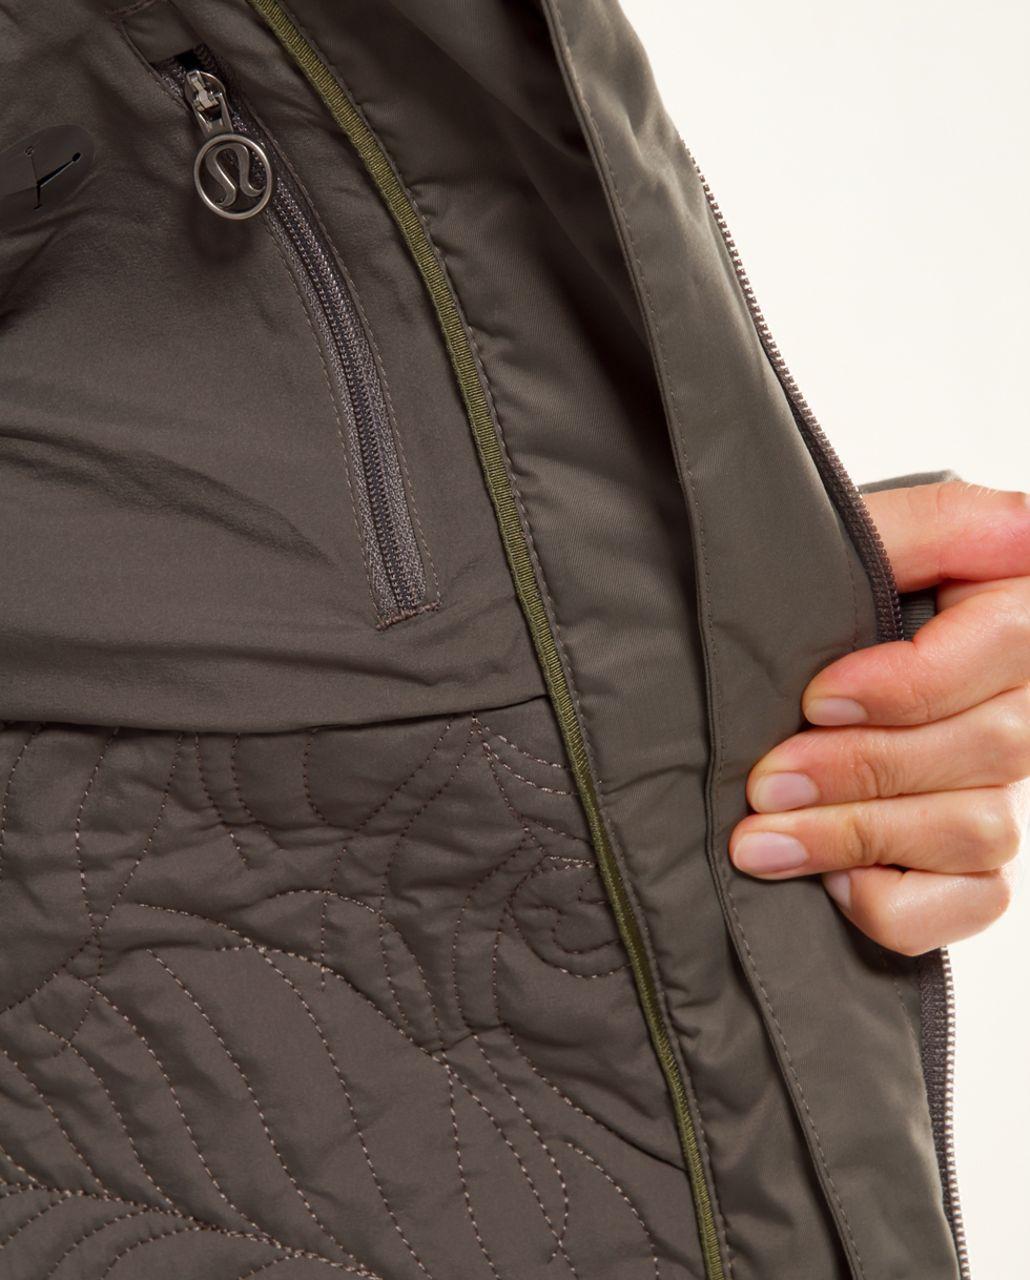 Lululemon Apres Piste Jacket - Wren /  Oyster